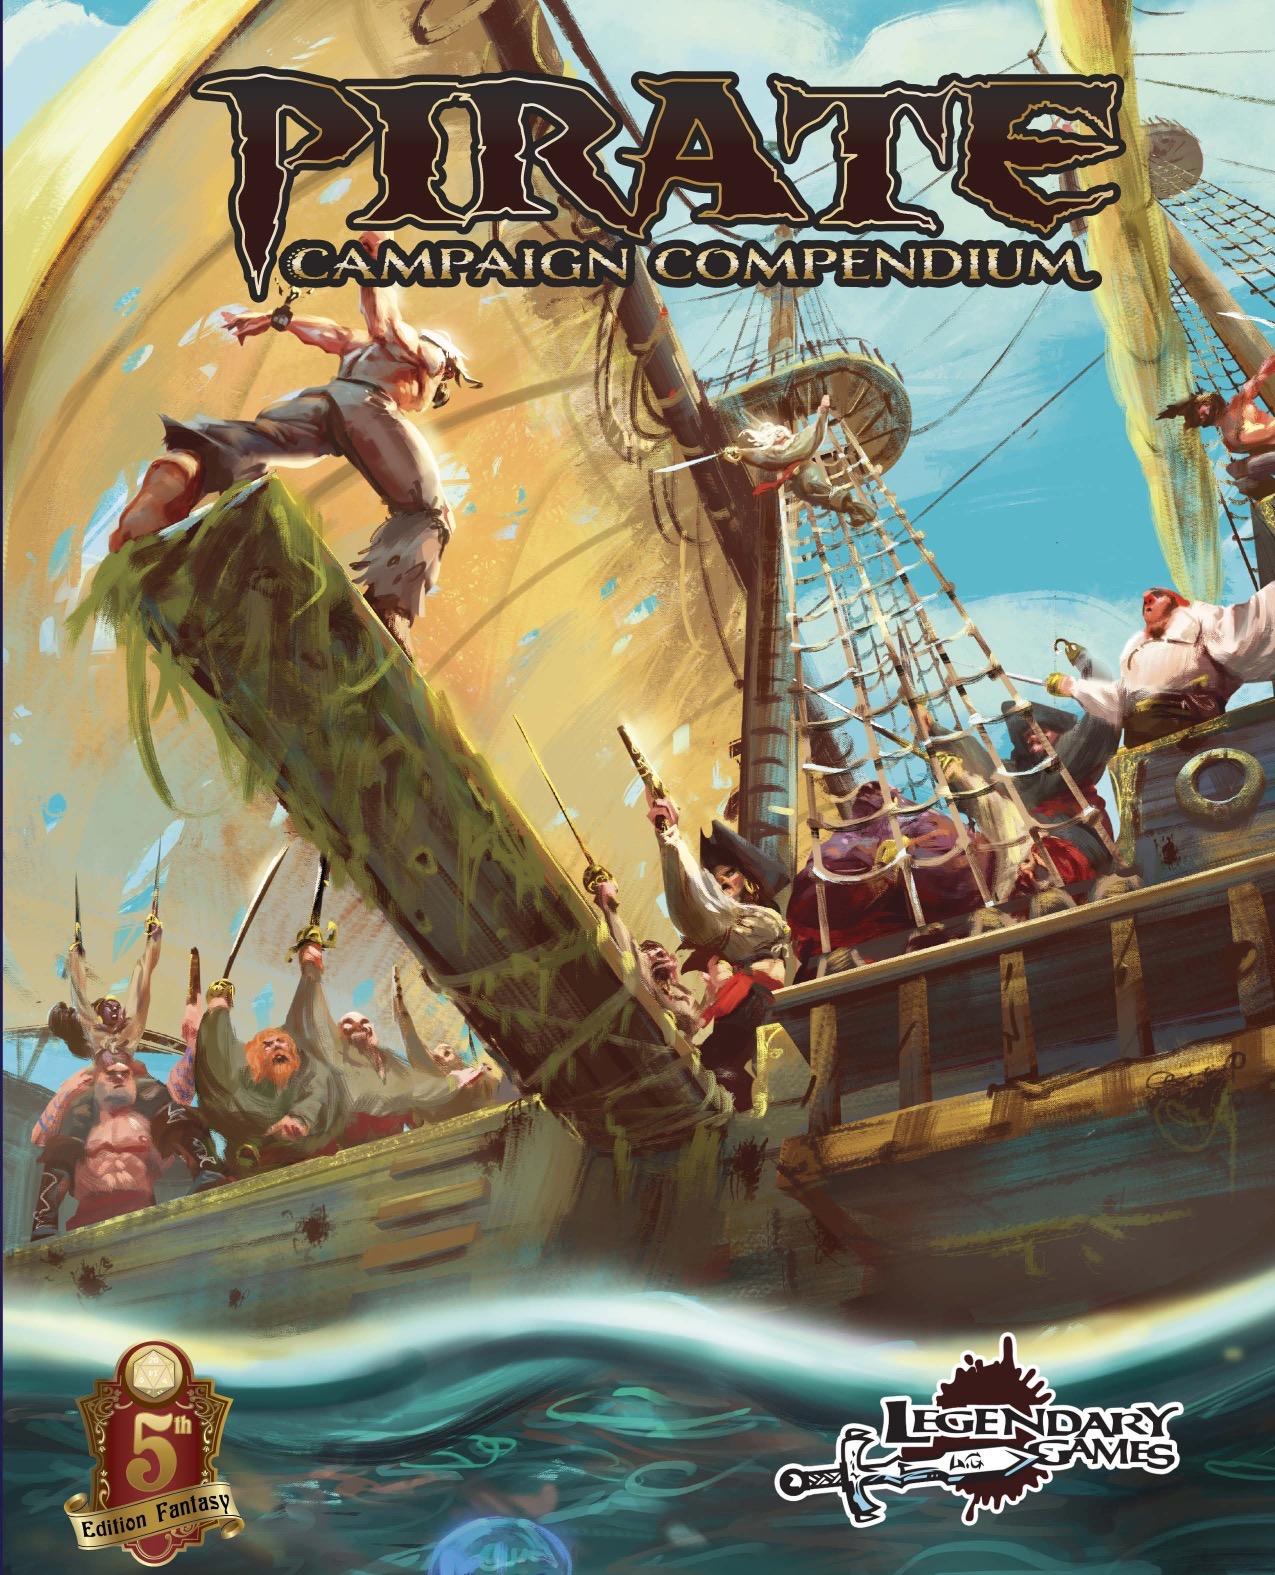 paizo com - Pirate Campaign Compendium (5E) PDF